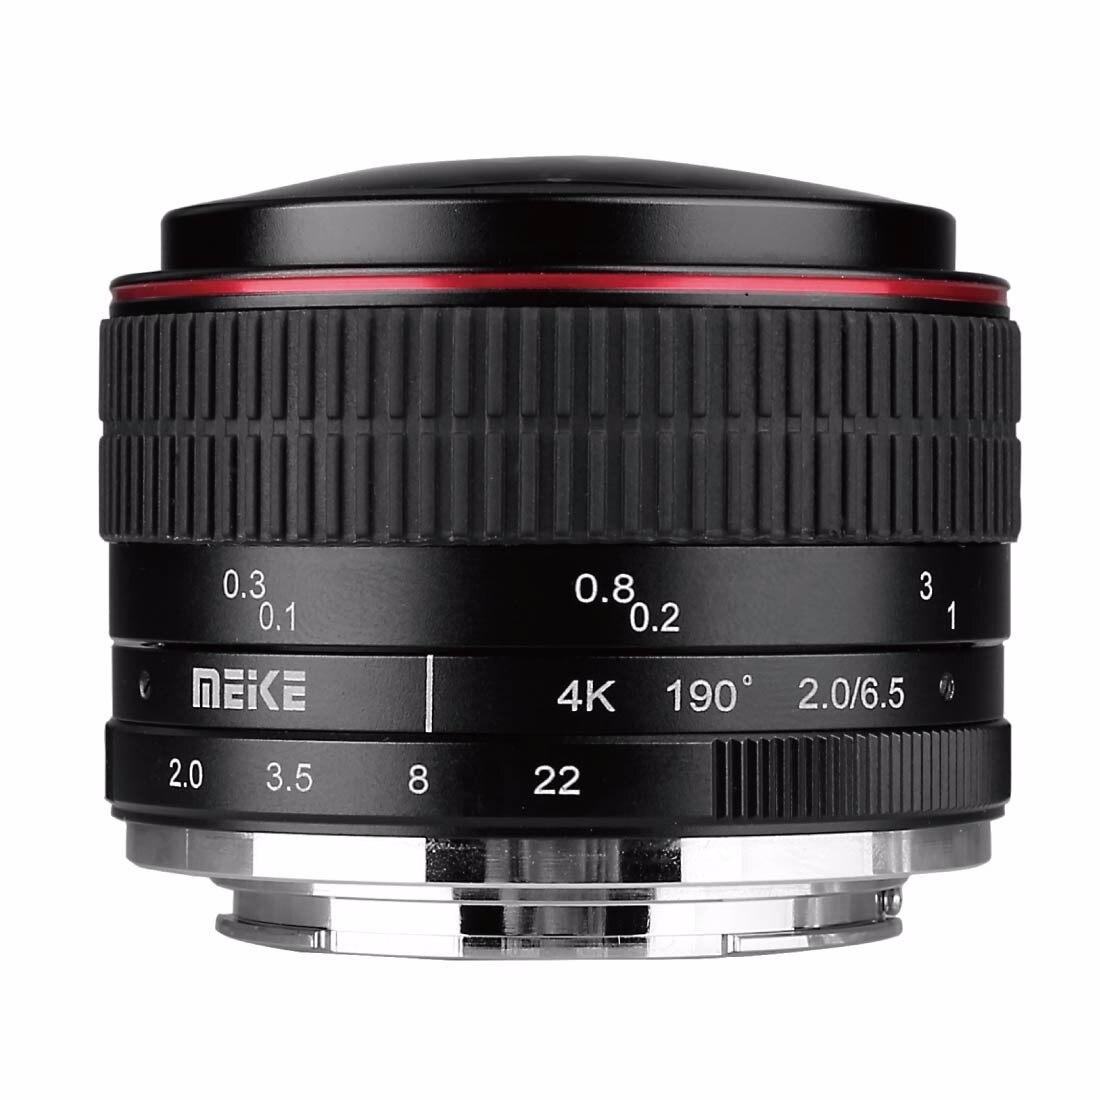 MEIKE 6.5mm F2.0 objectif Fisheye pour Canon EOS M Nikon 1 Sony E Fuji Fujifilm X Olympus Panasonic M4/3 monture appareil photo sans miroir